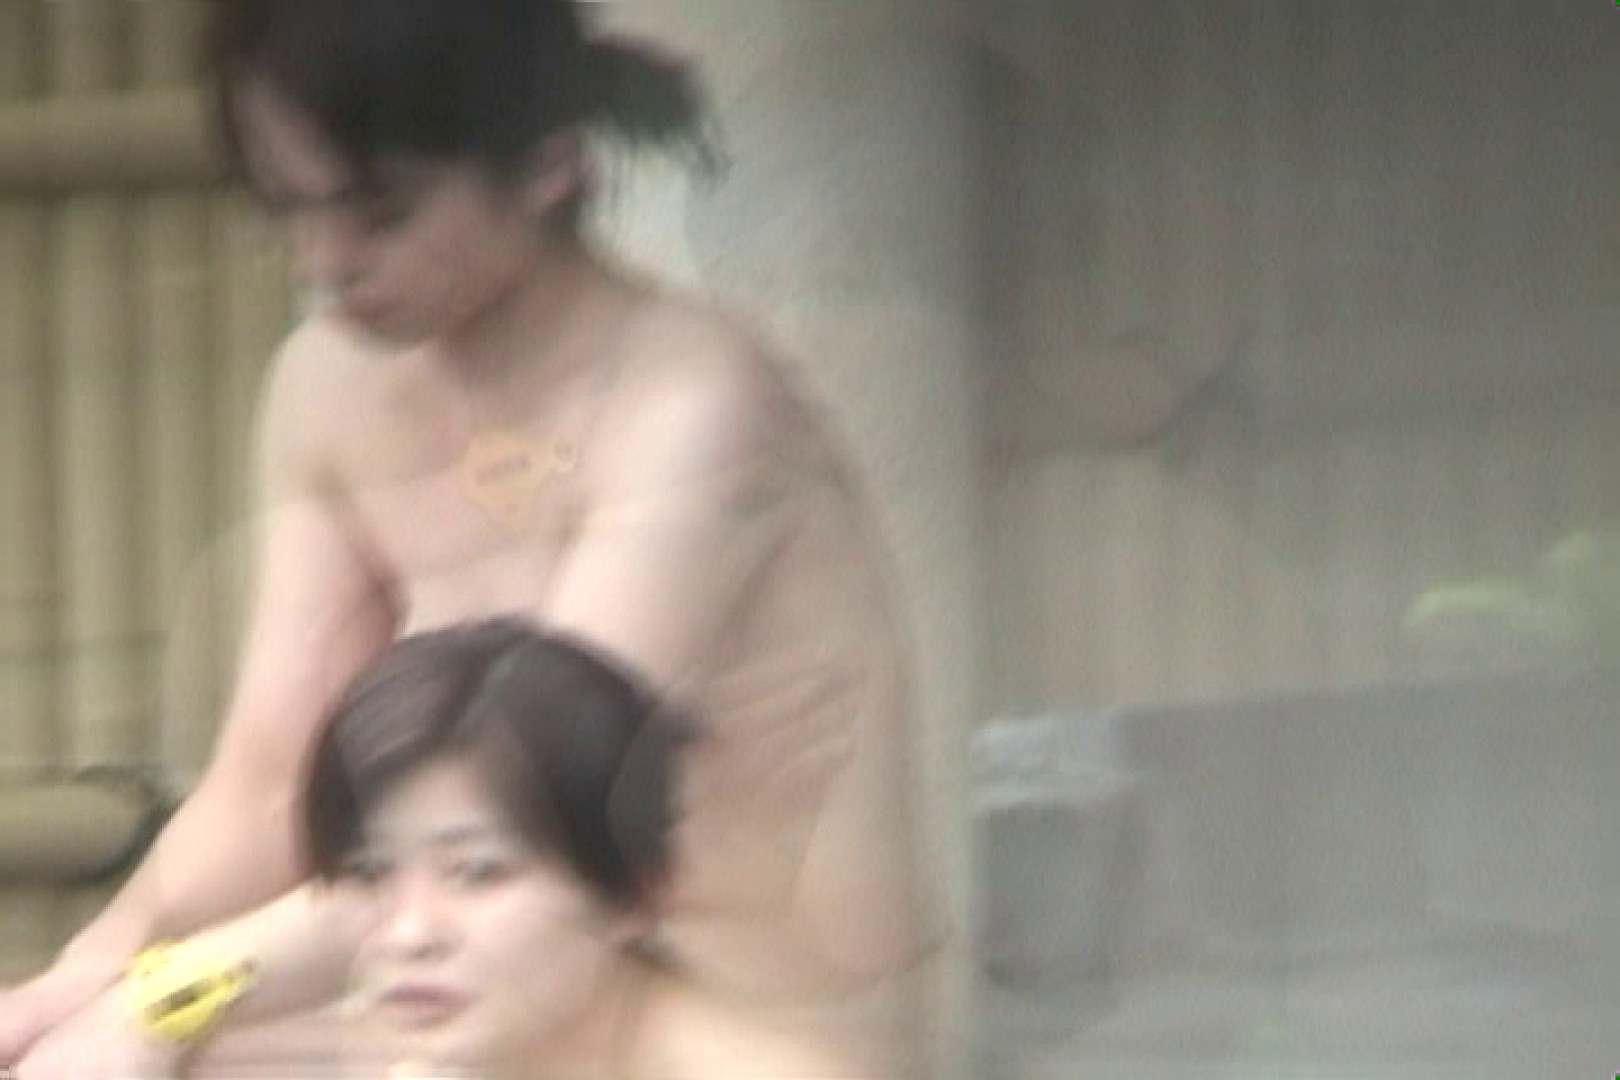 Aquaな露天風呂Vol.558 盗撮師作品  86pic 66